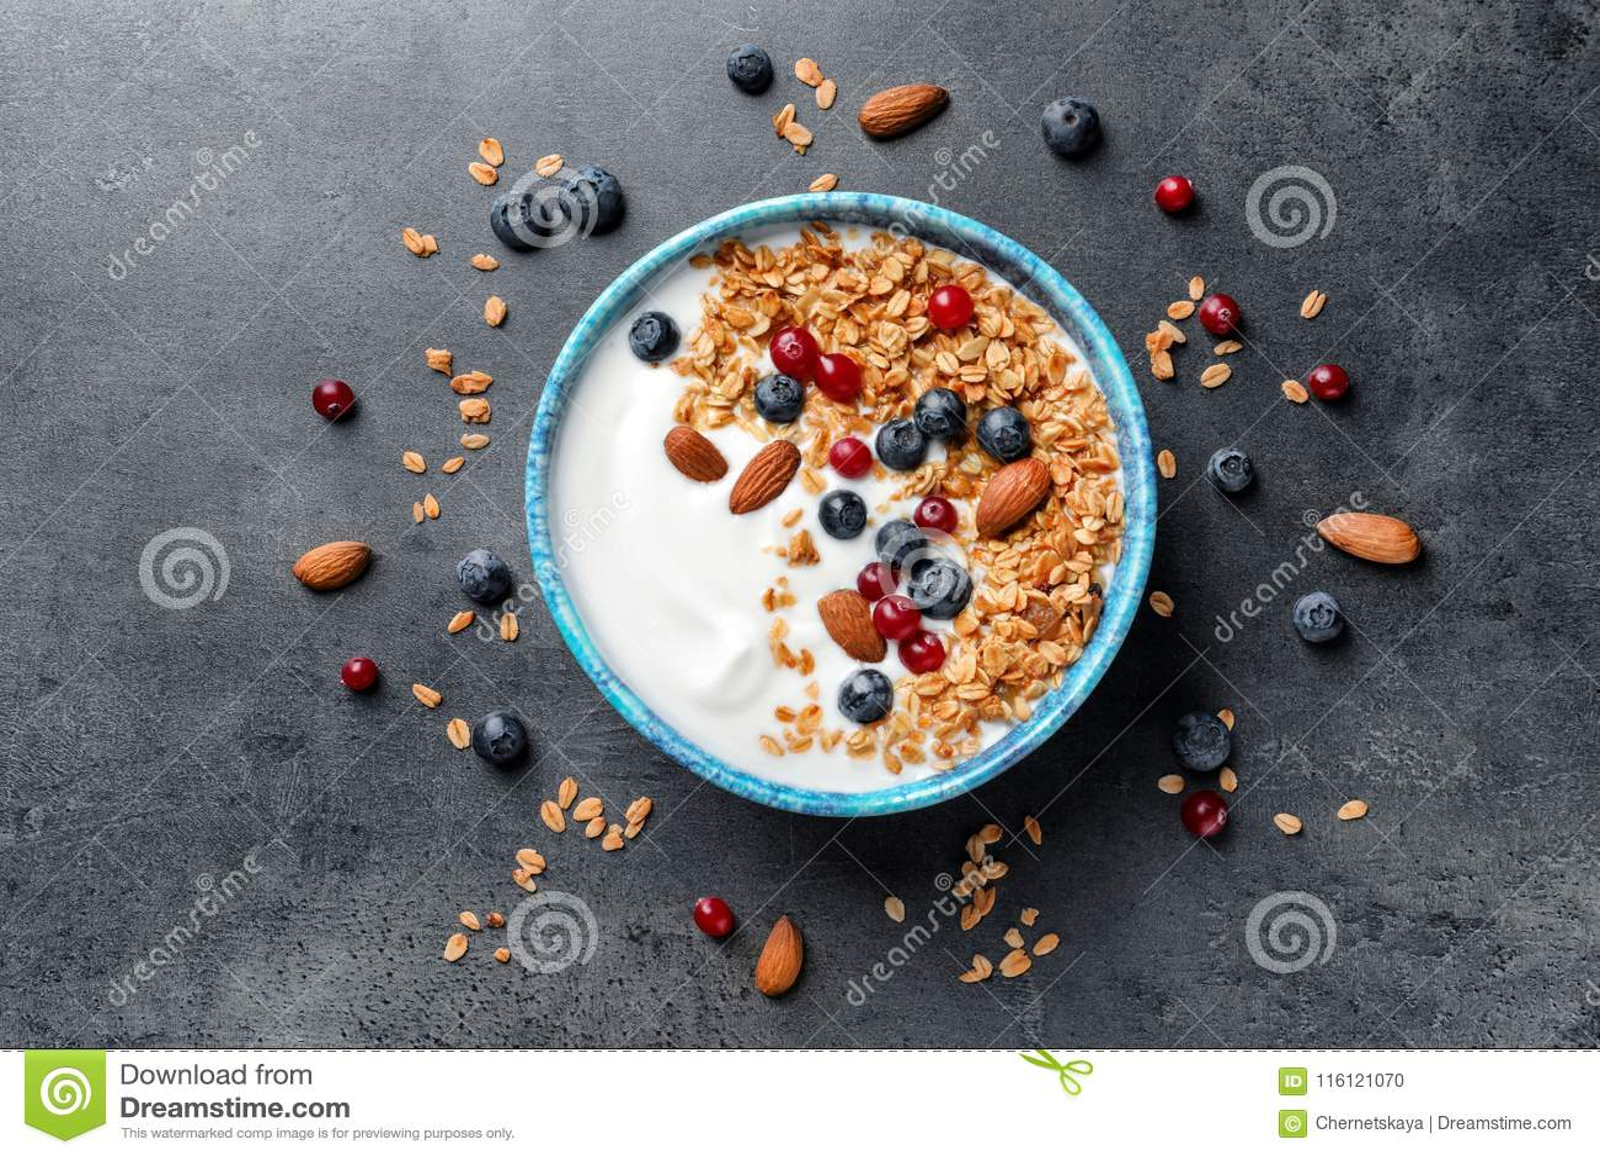 Bowl with yogurt, berries and granola